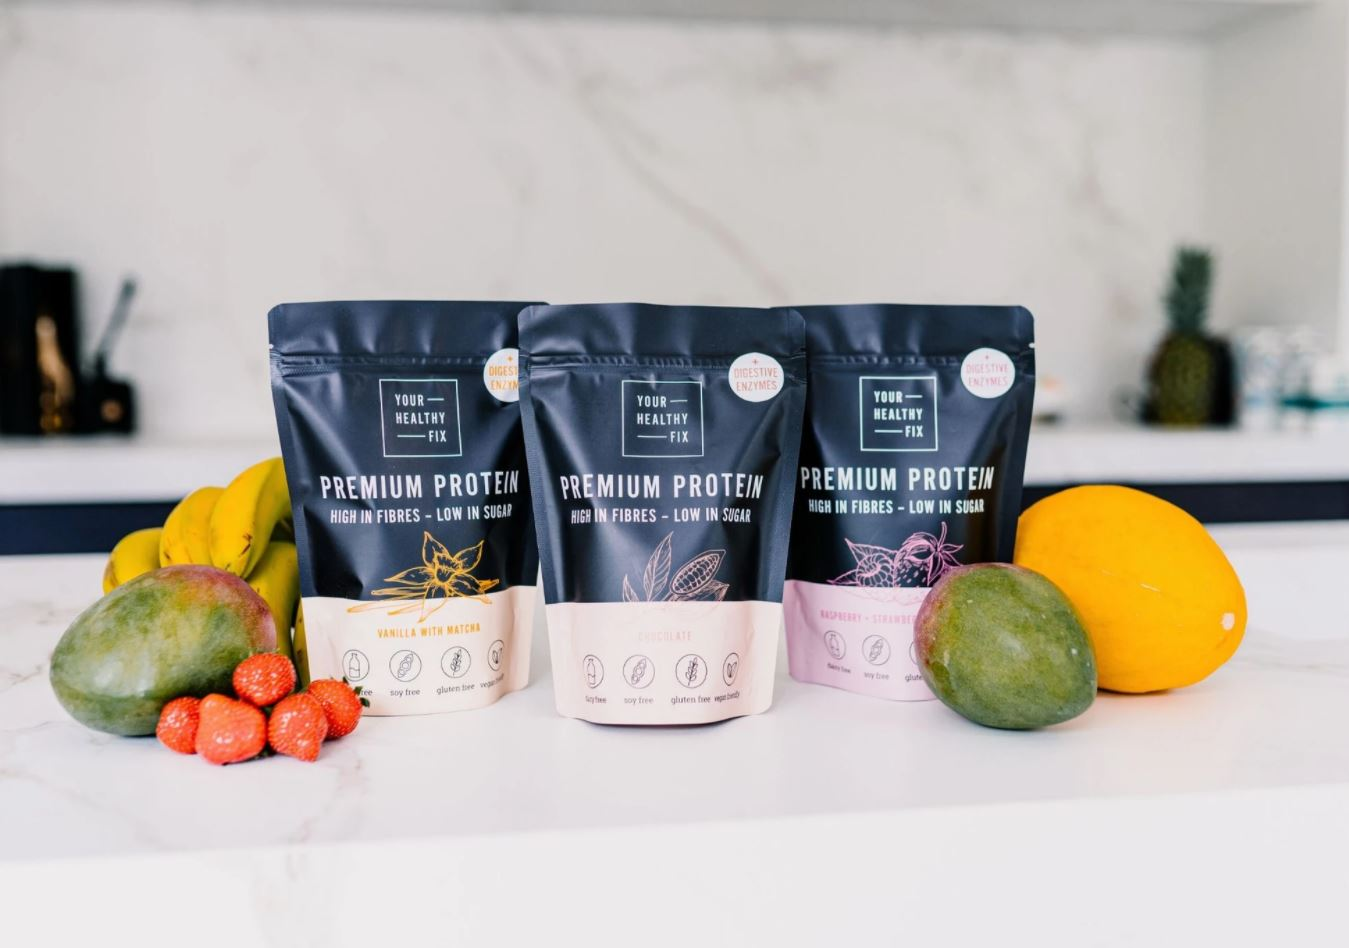 Waarom je best voor plantaardige proteïnepoeders kiest